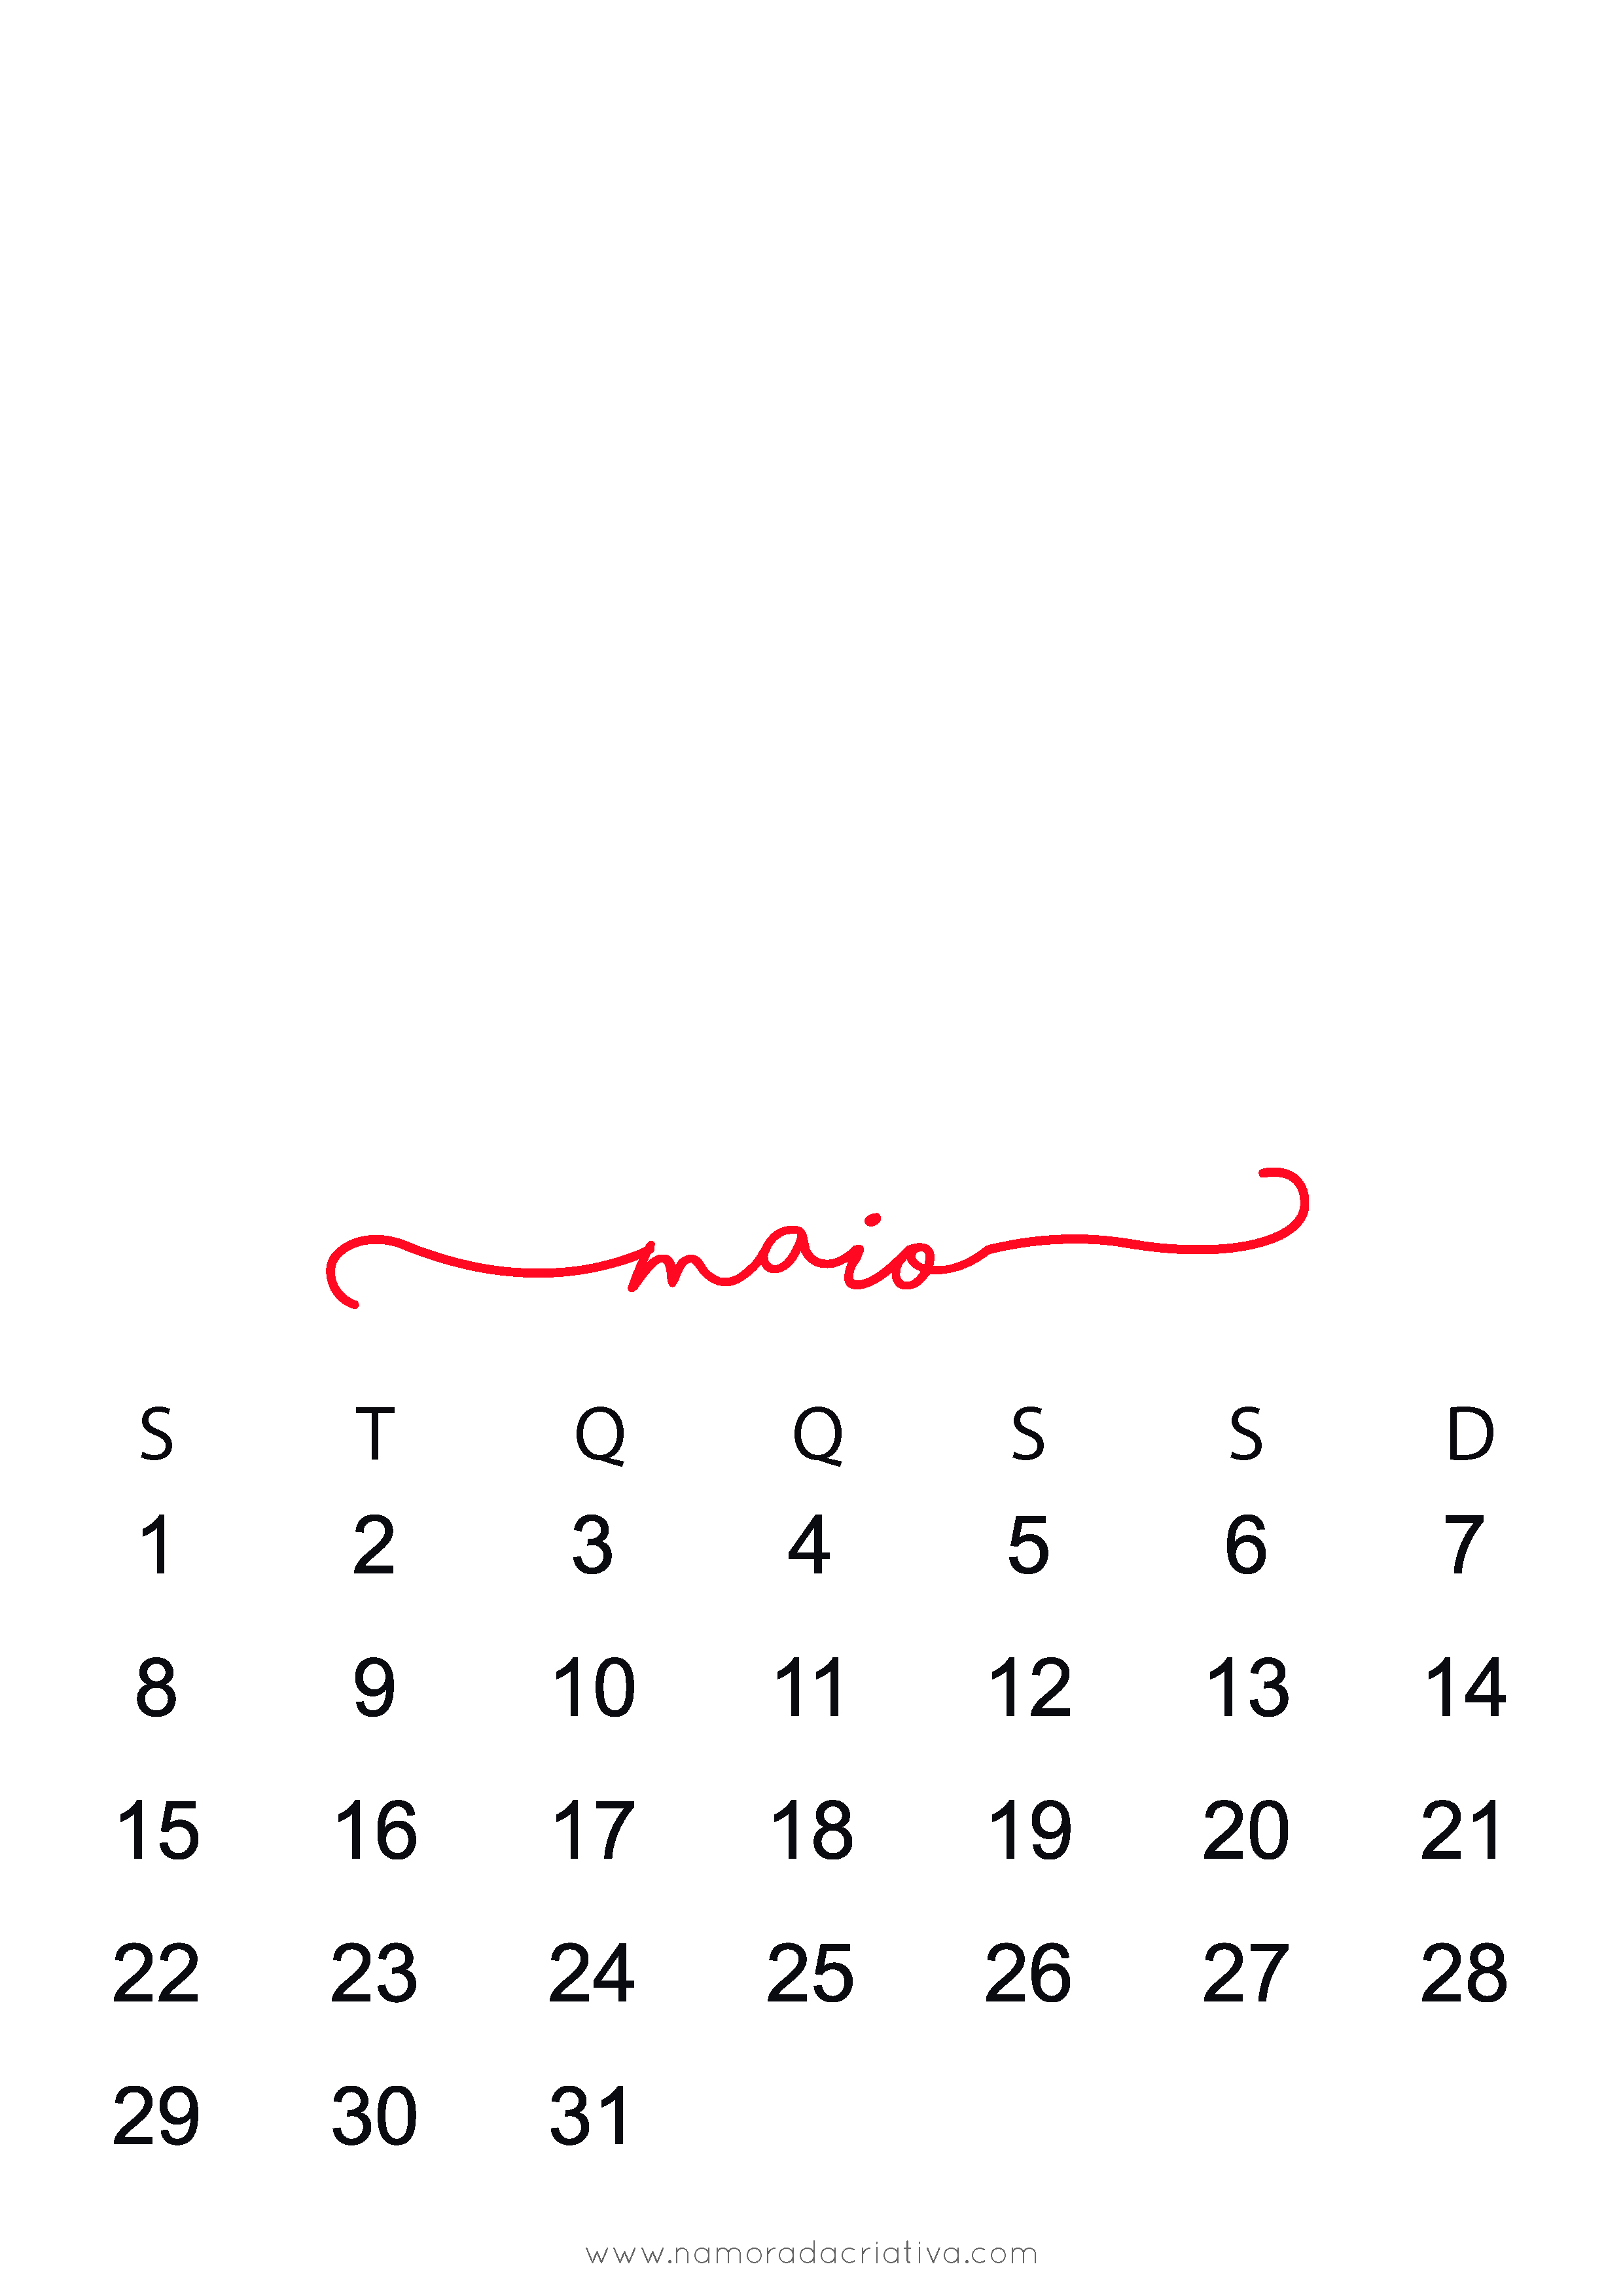 Calendario 2017 Personalizavel Namorada Criativa Por Chaiene